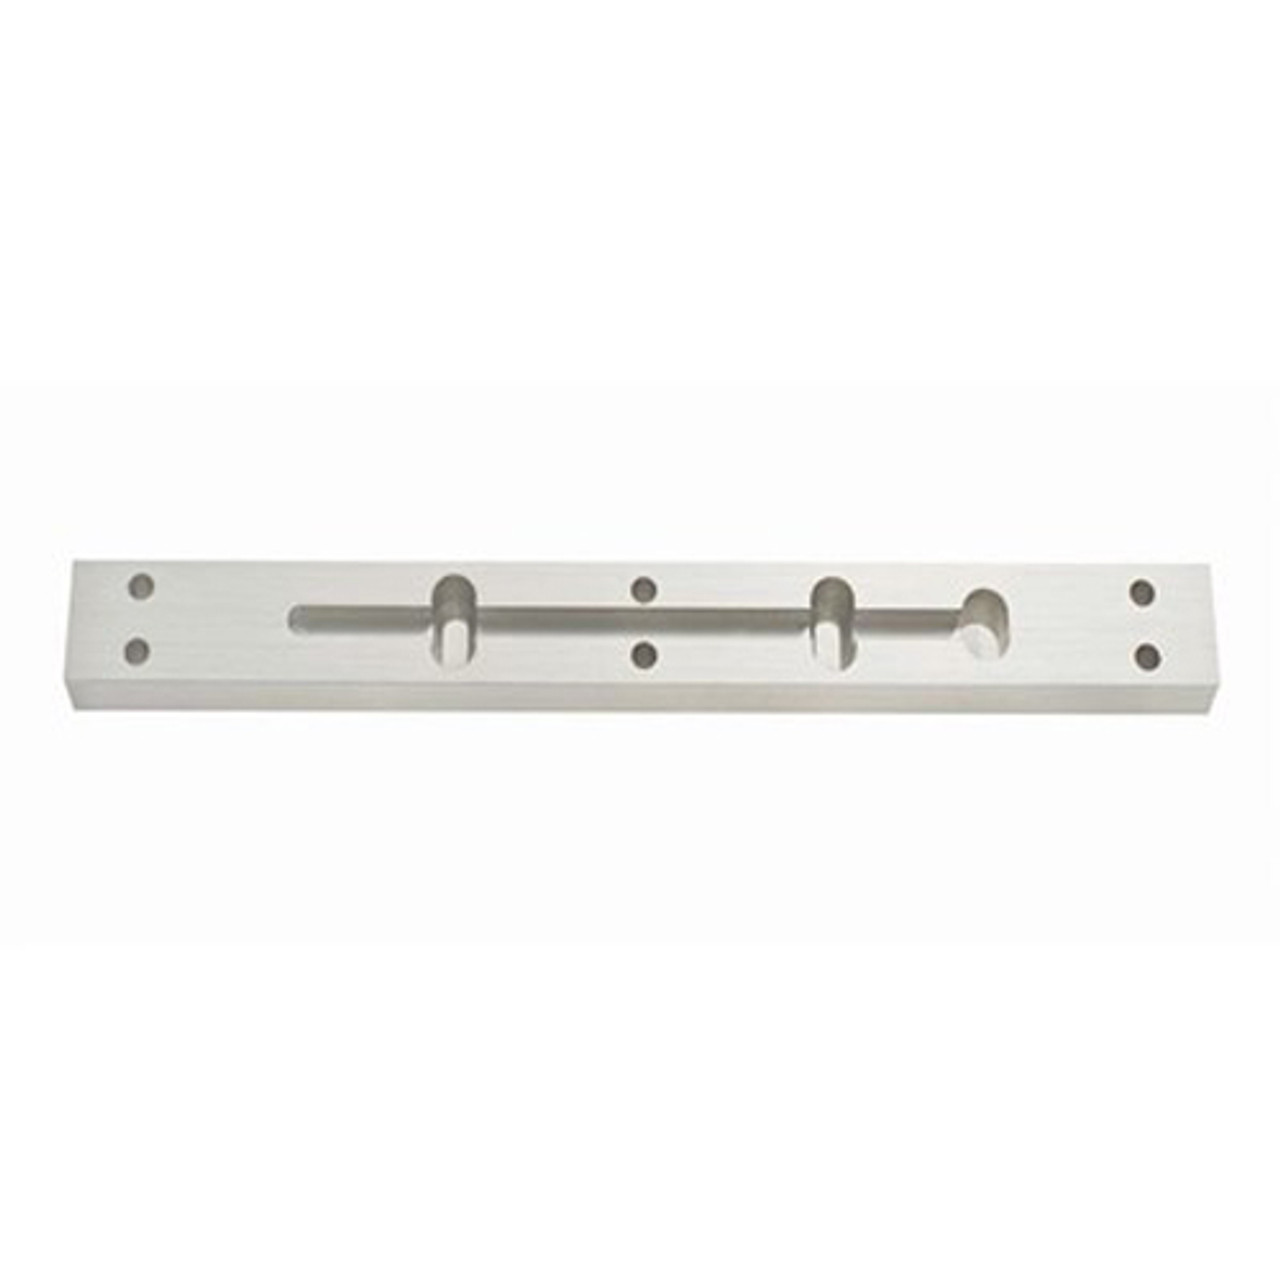 ASP-AM3330 ASP Alarm Control Mounting Brackets For Magnetic Locks